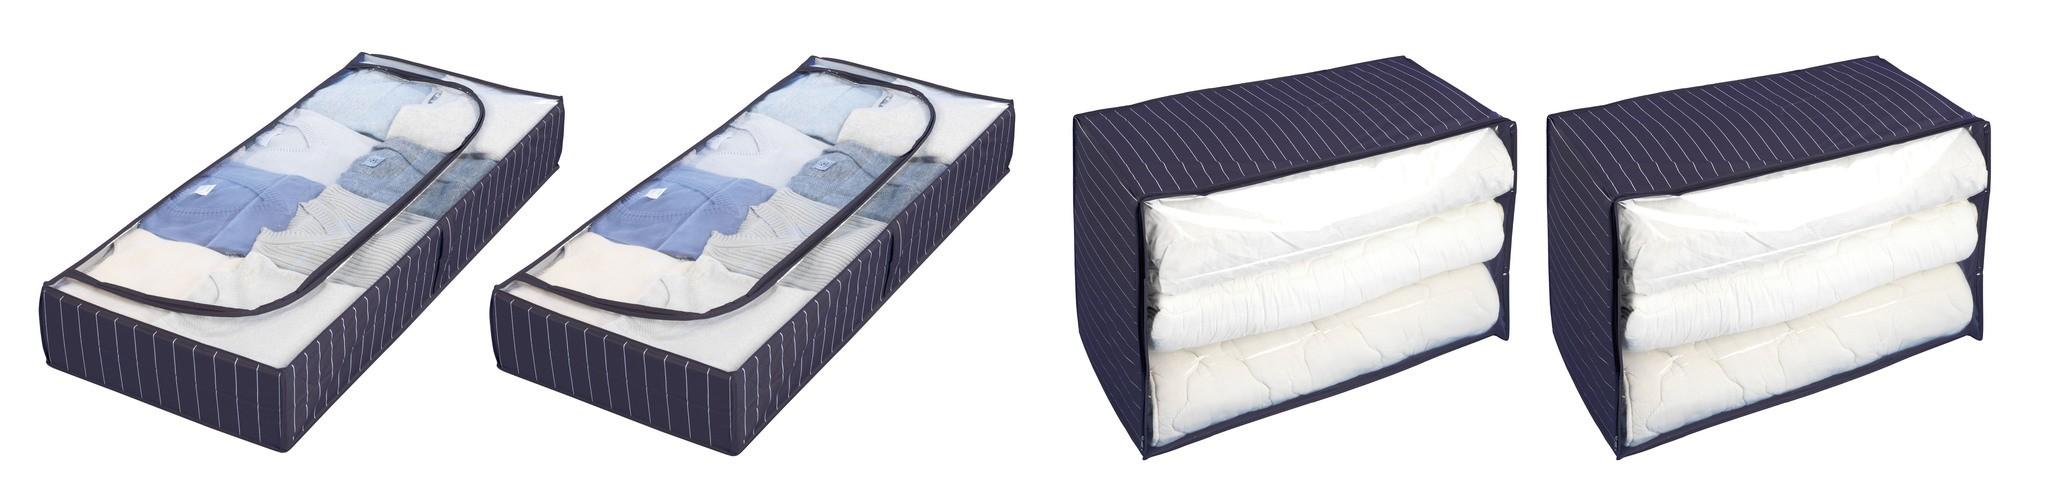 Wenko Aufbewahrungs-Set Comfort, 2x Unterbettkommode & 2x Jumbobox